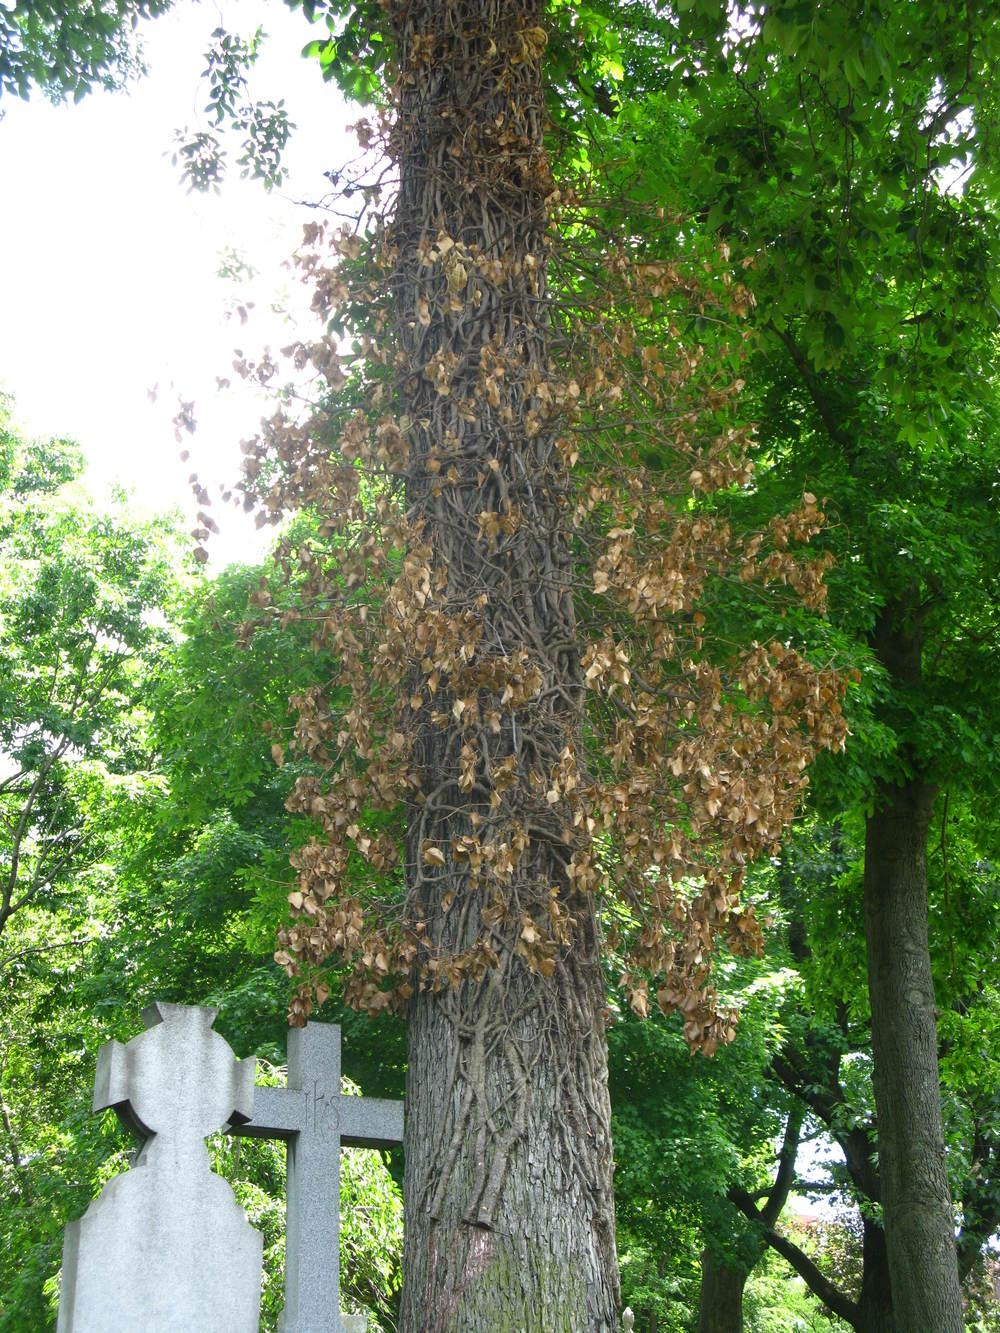 Toxicodendron radicansAnacardiaceae